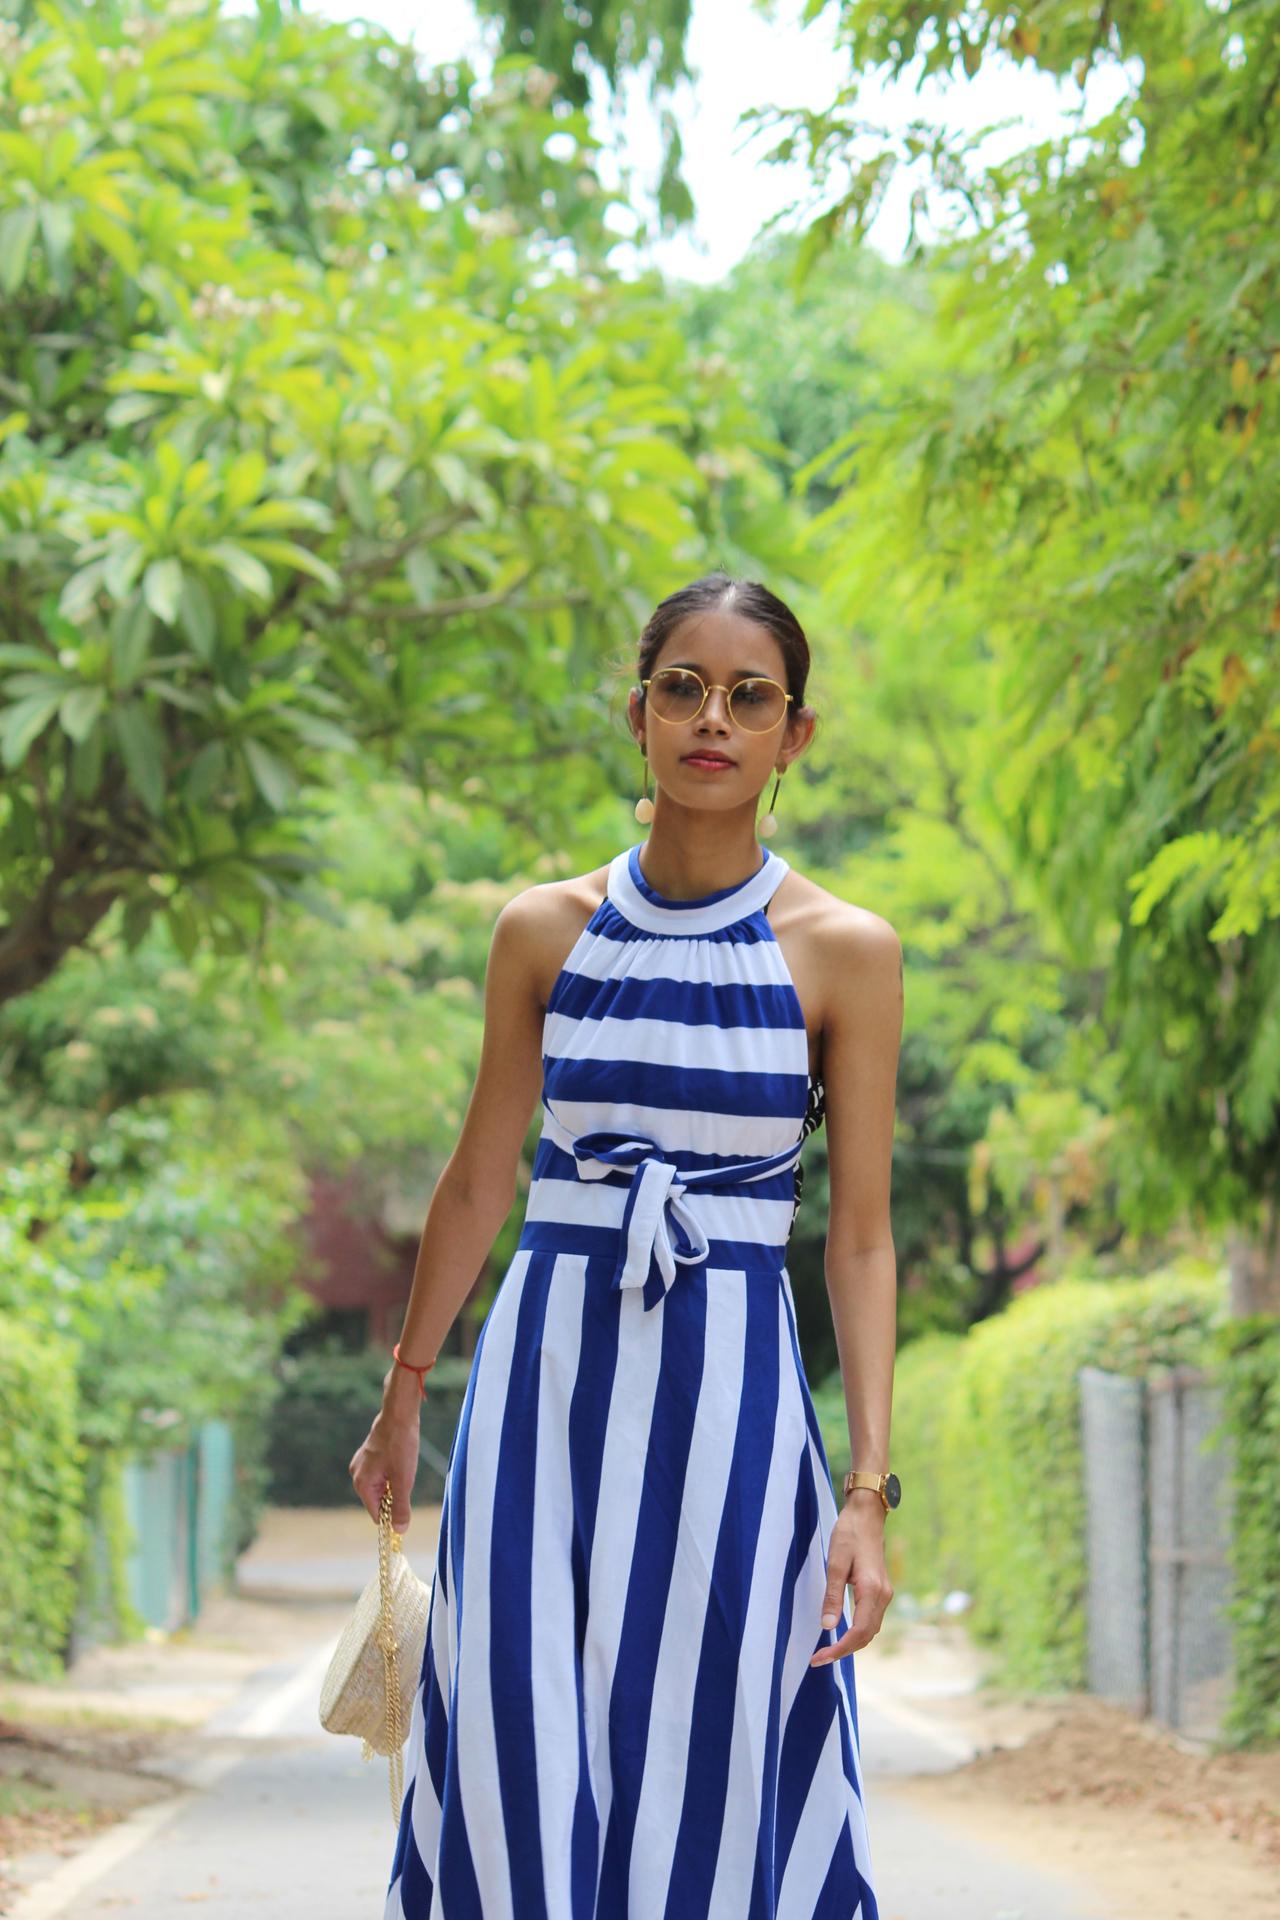 Under 3k maxi dresses  image